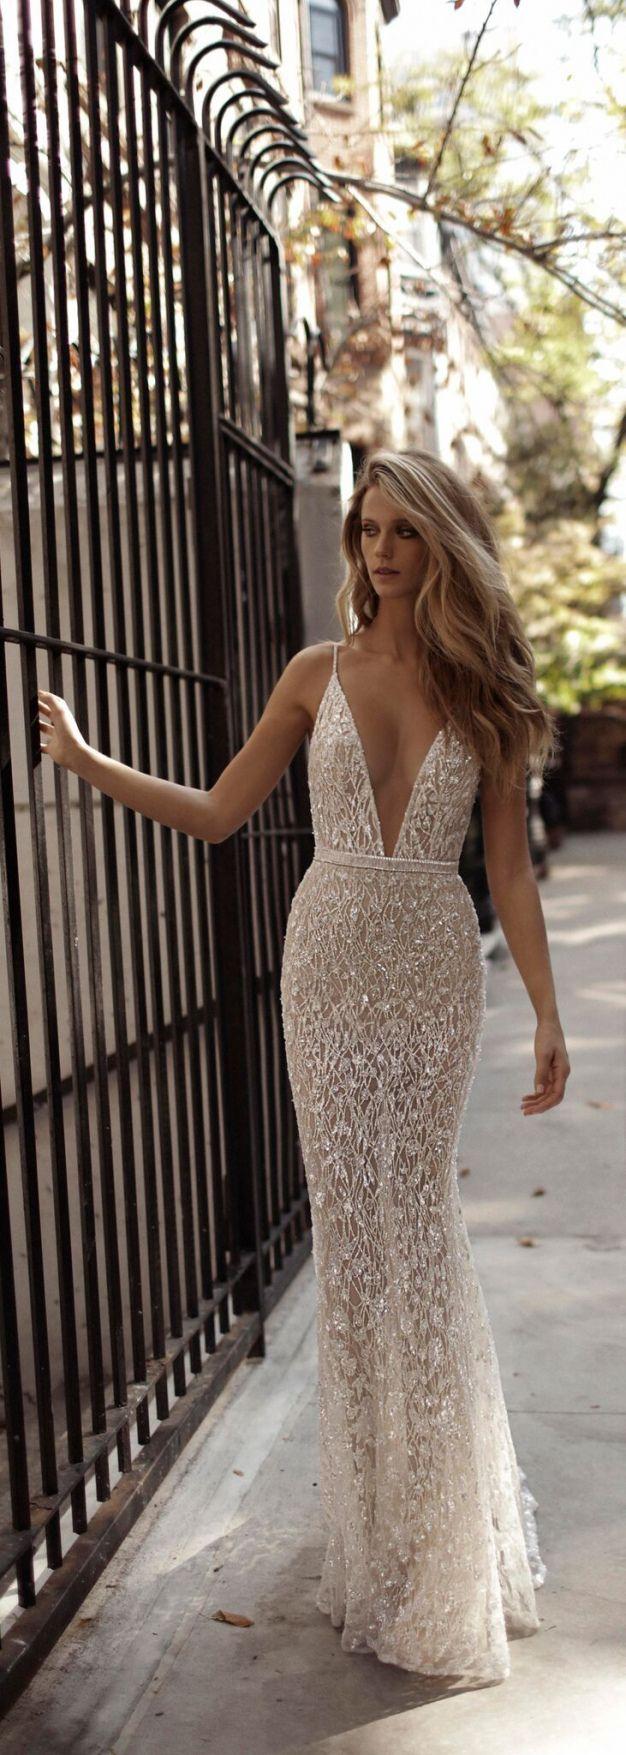 second dress wedding reception dresses for wedding reception